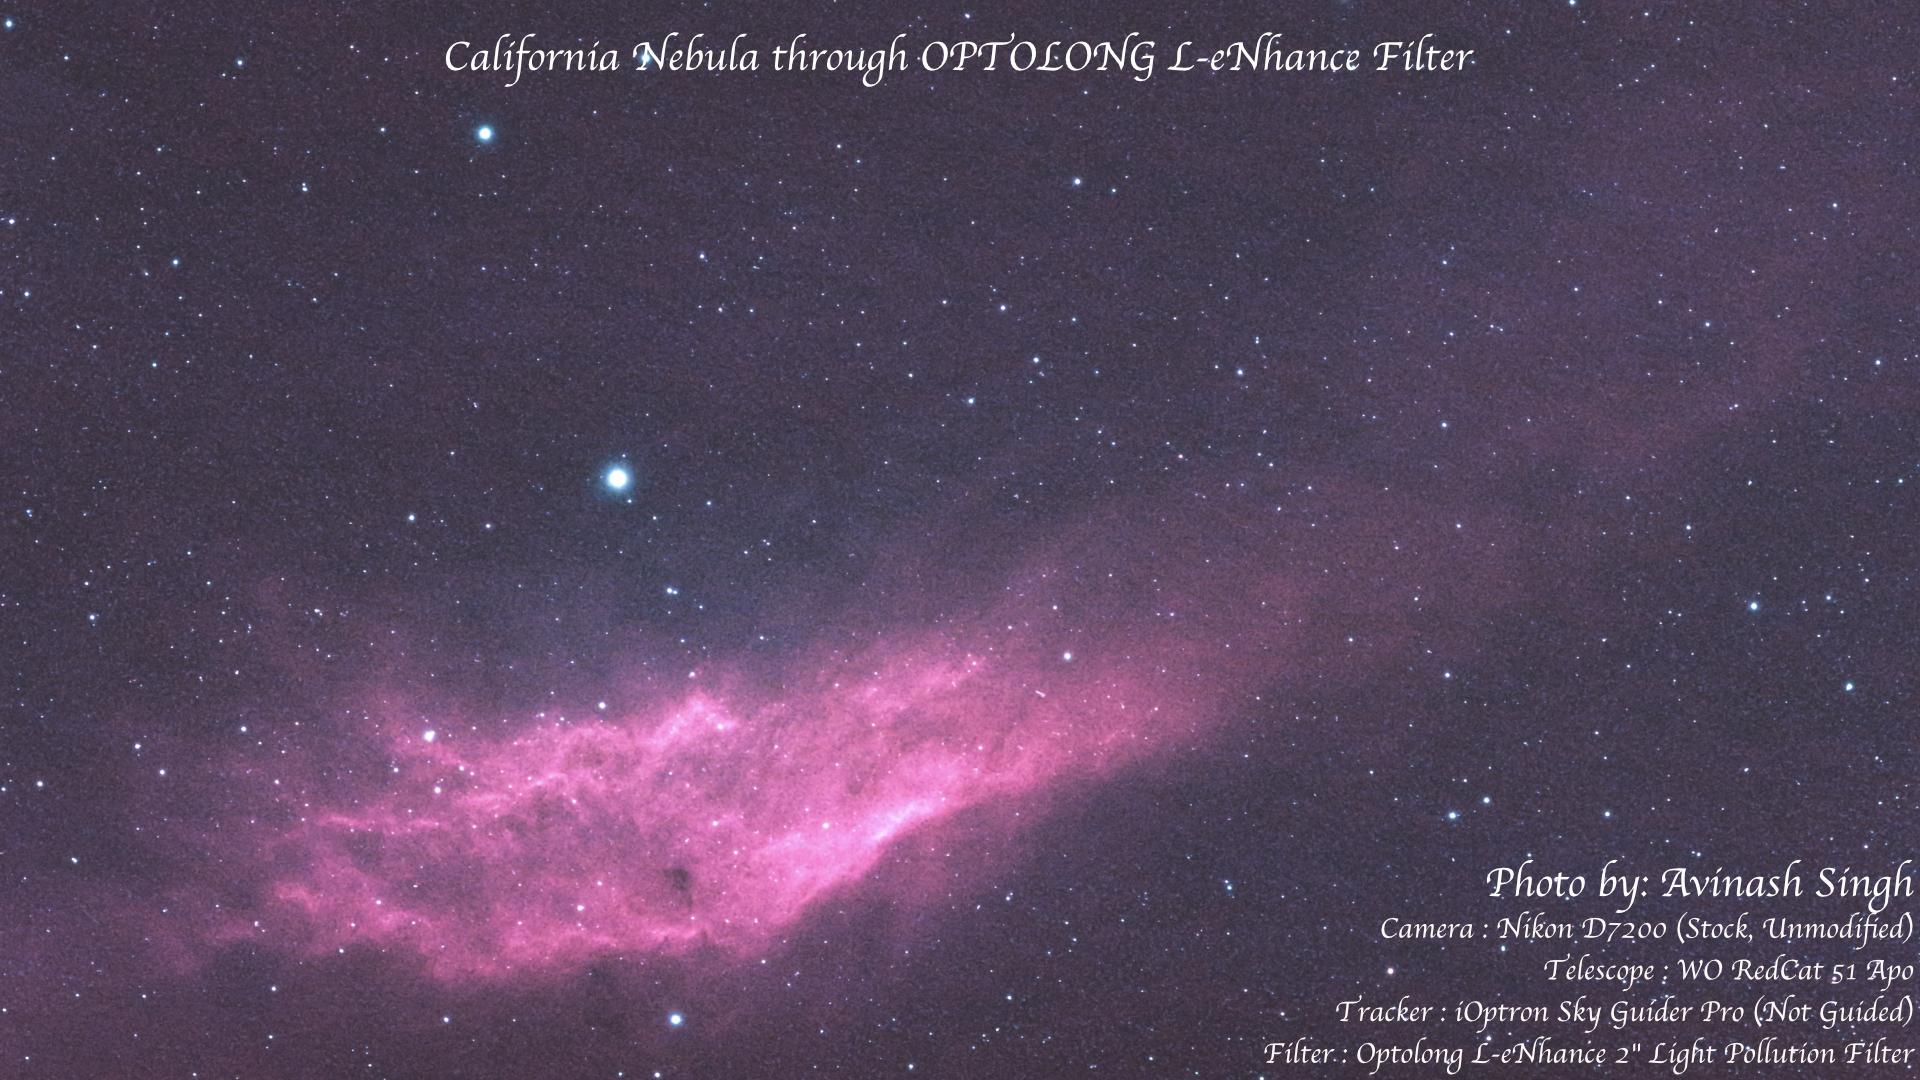 Avinash Singh California Nebula